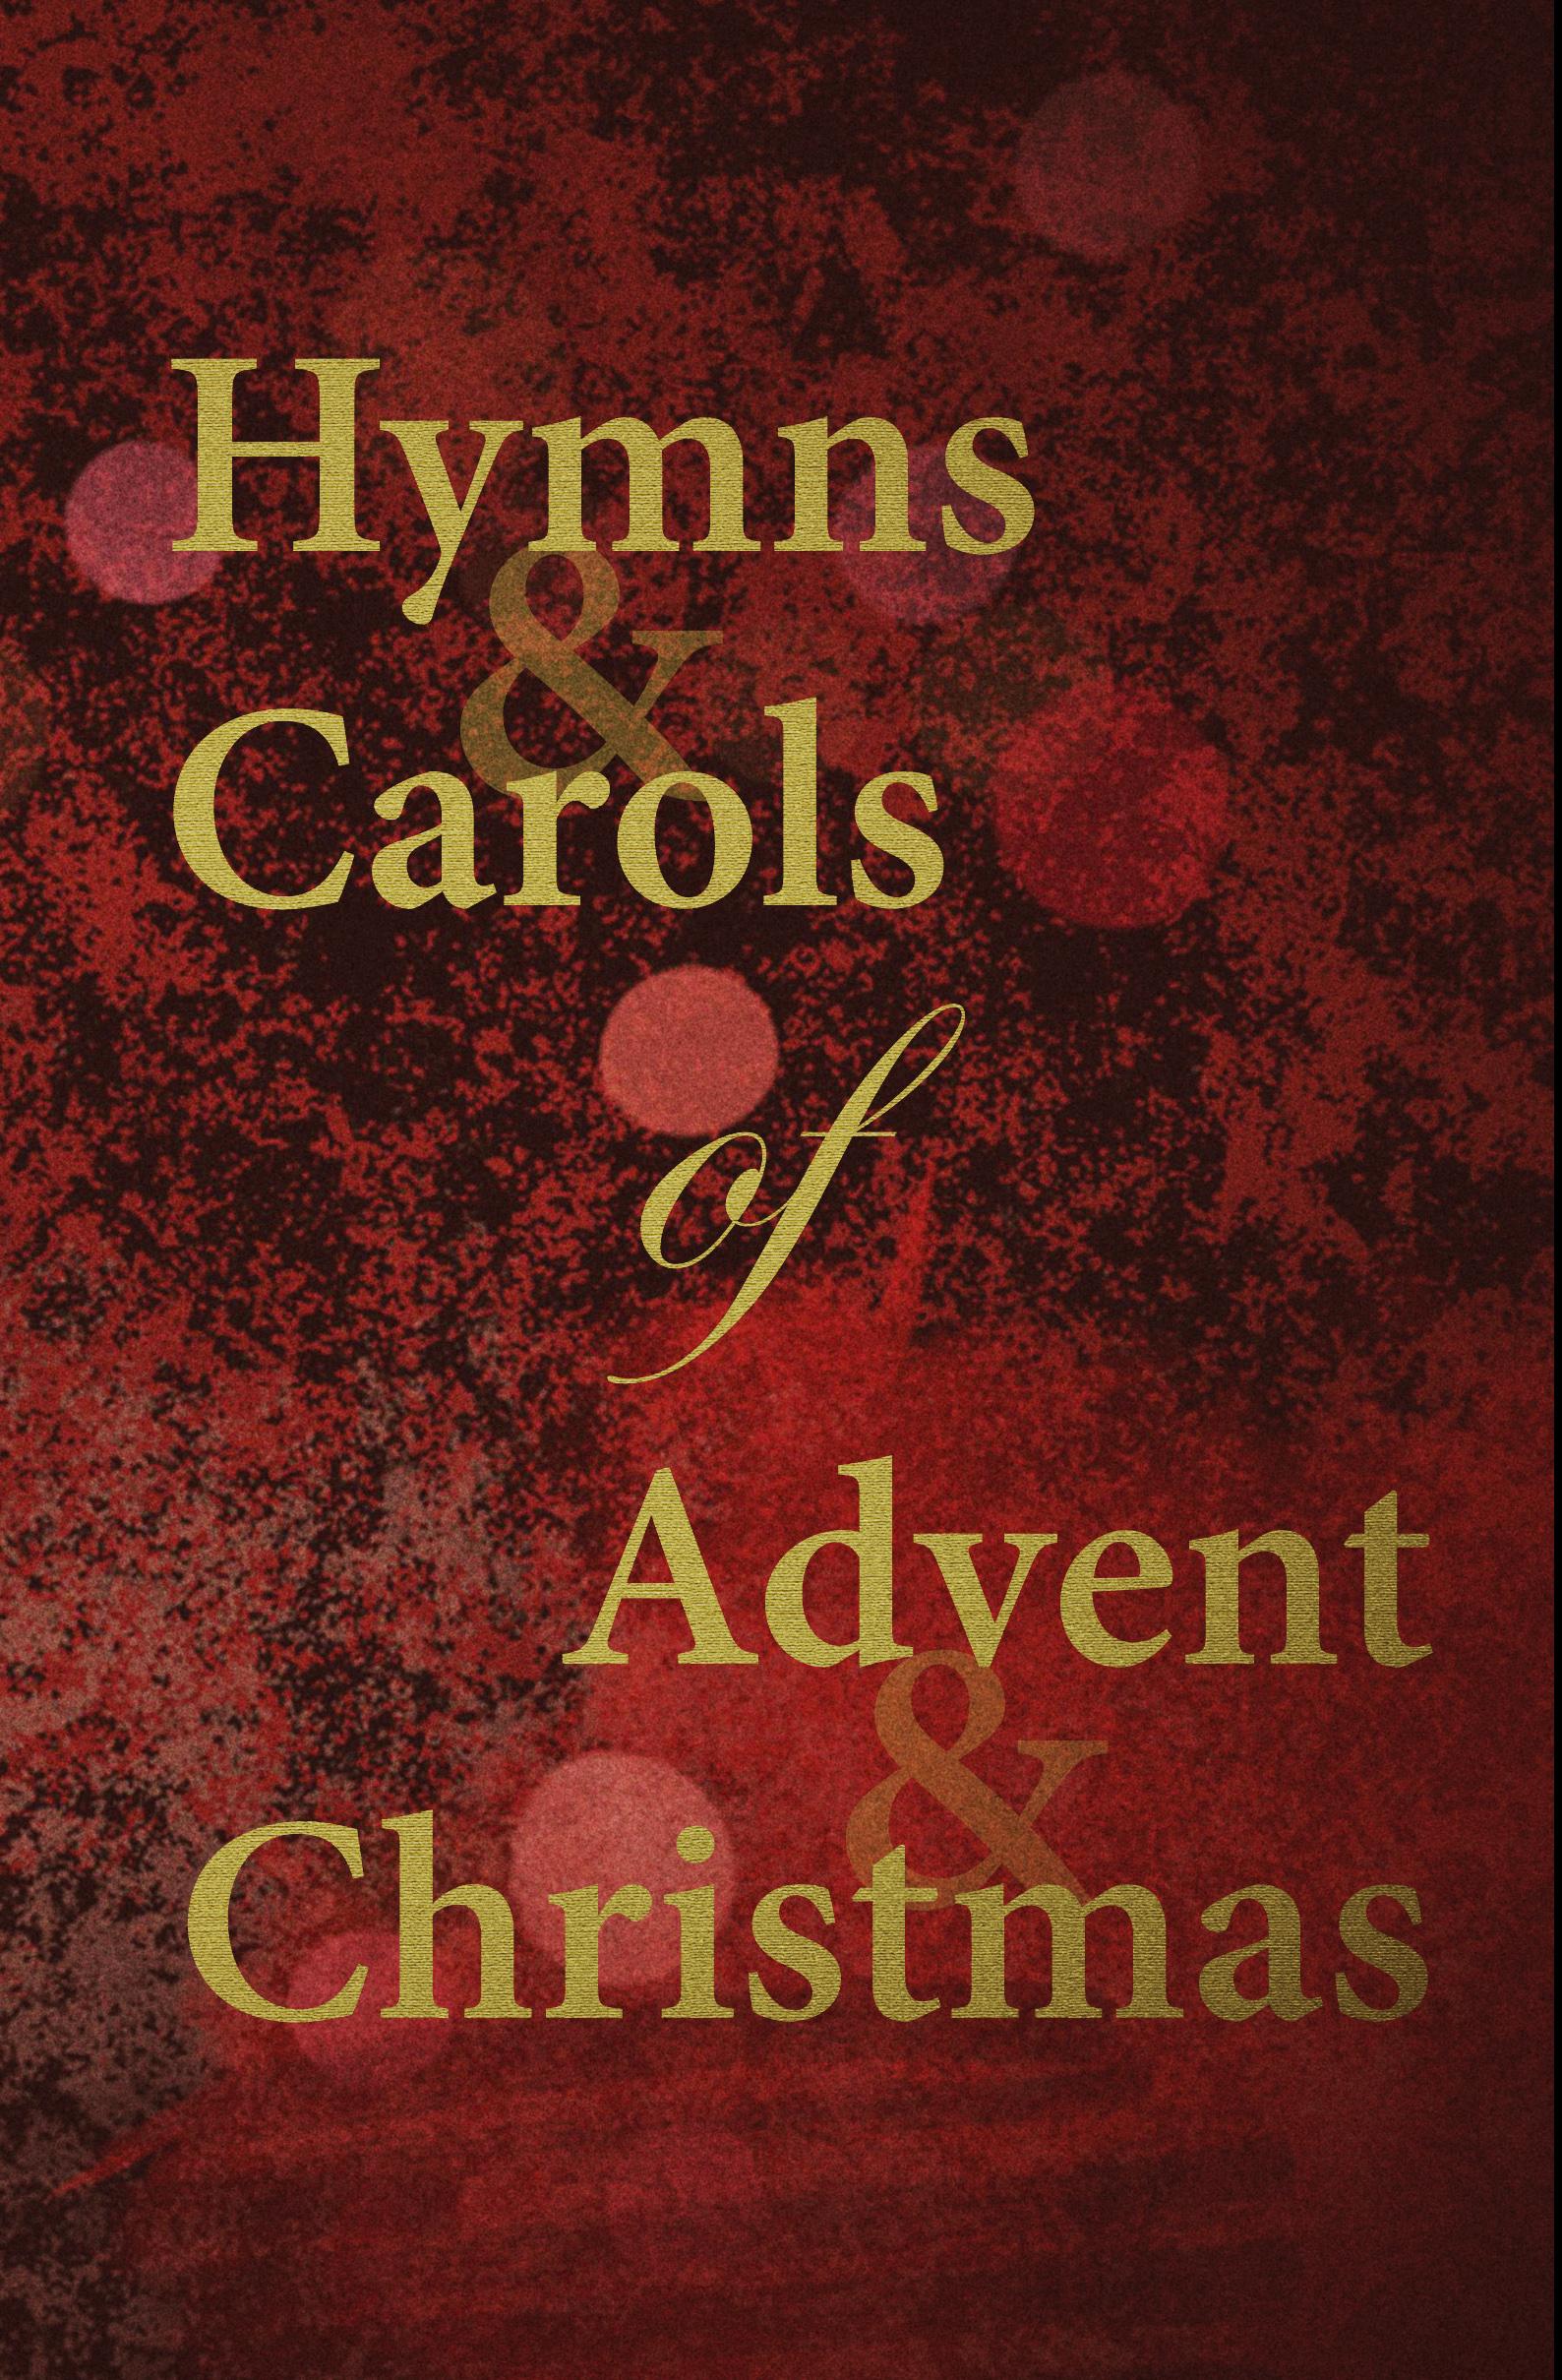 Advent Hymn Book